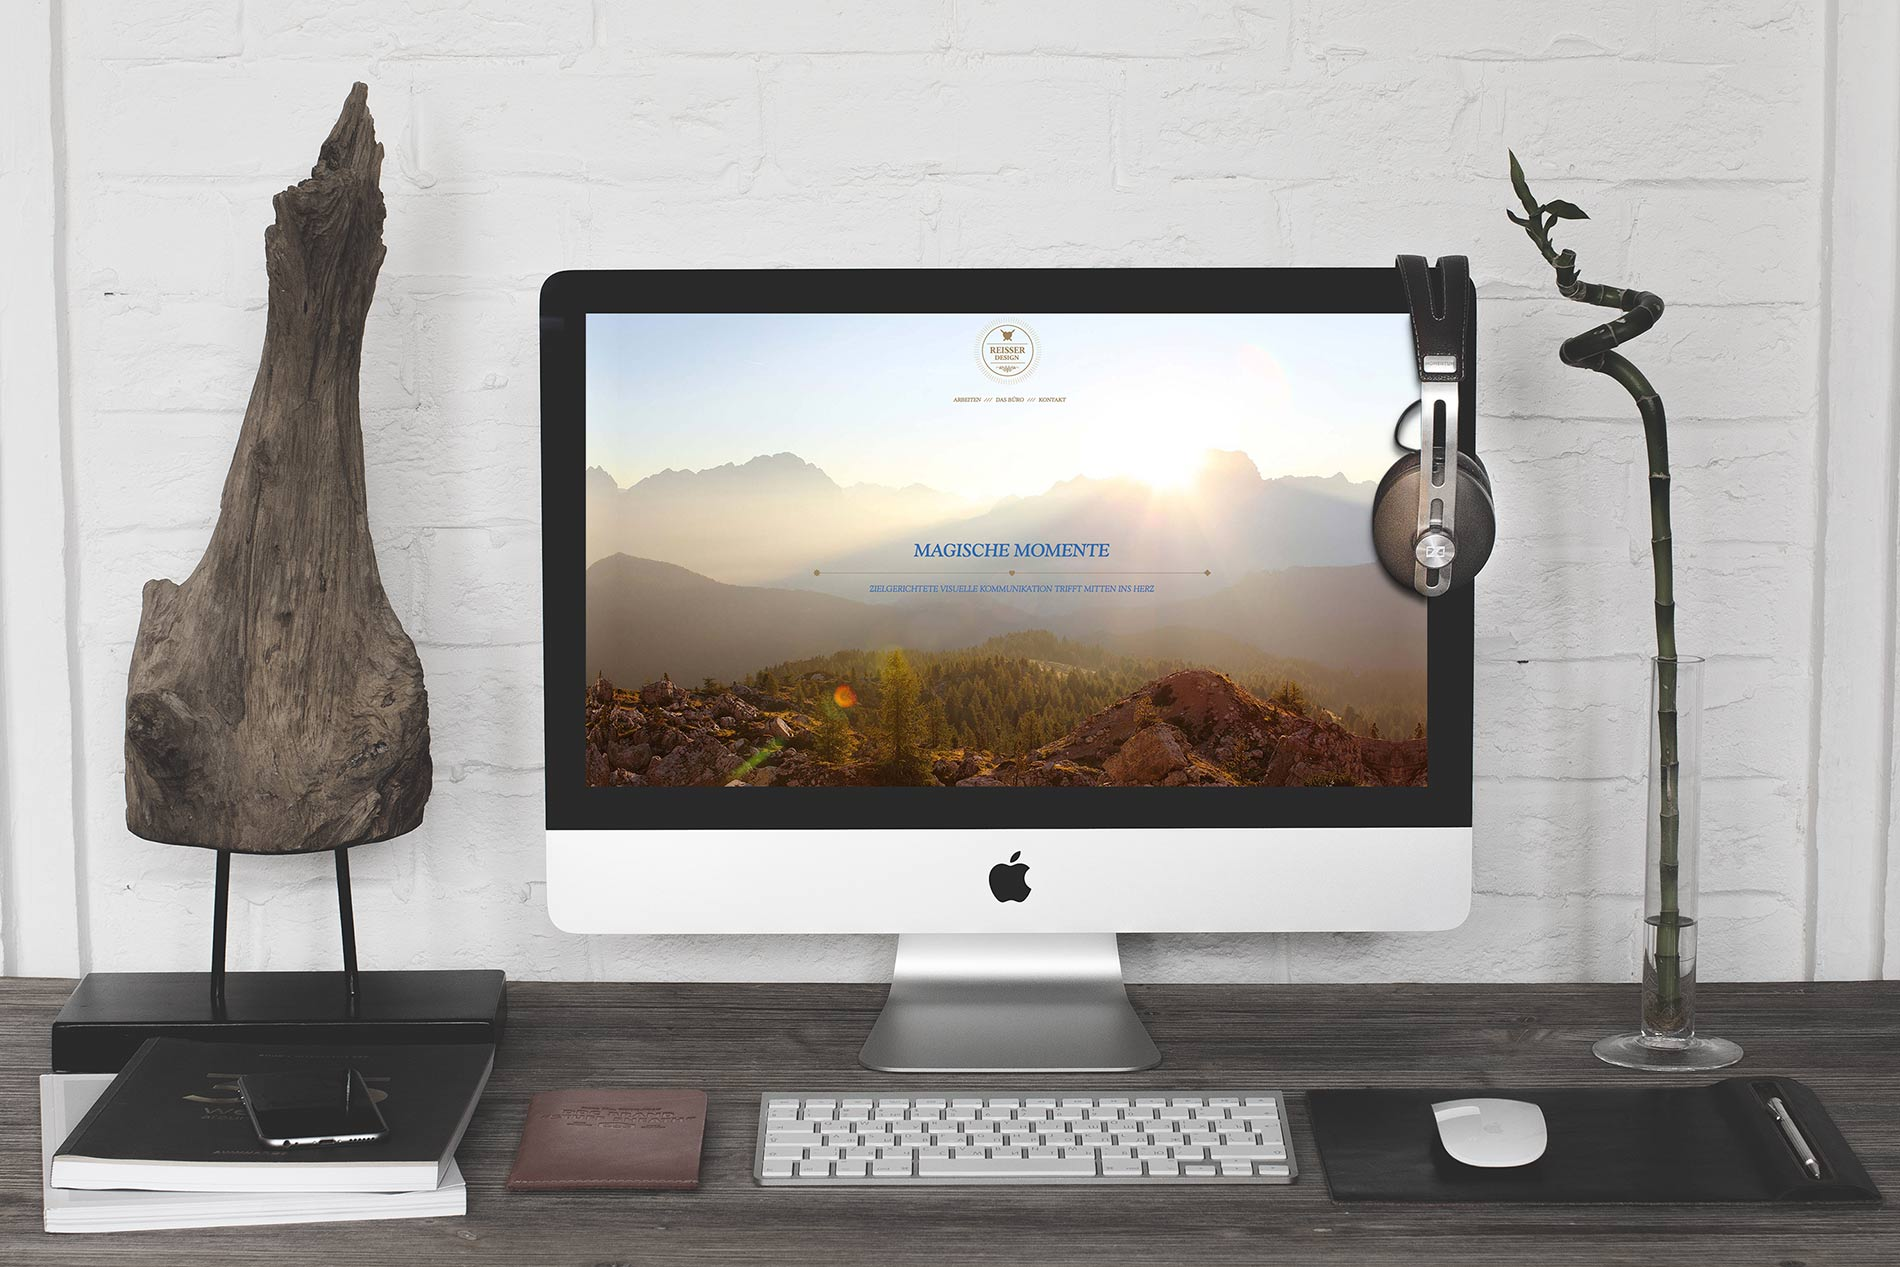 Janina-Lermer-Markengestaltung-Branddesign-Corporate-Design-Reisserdesign-Webseite-Website